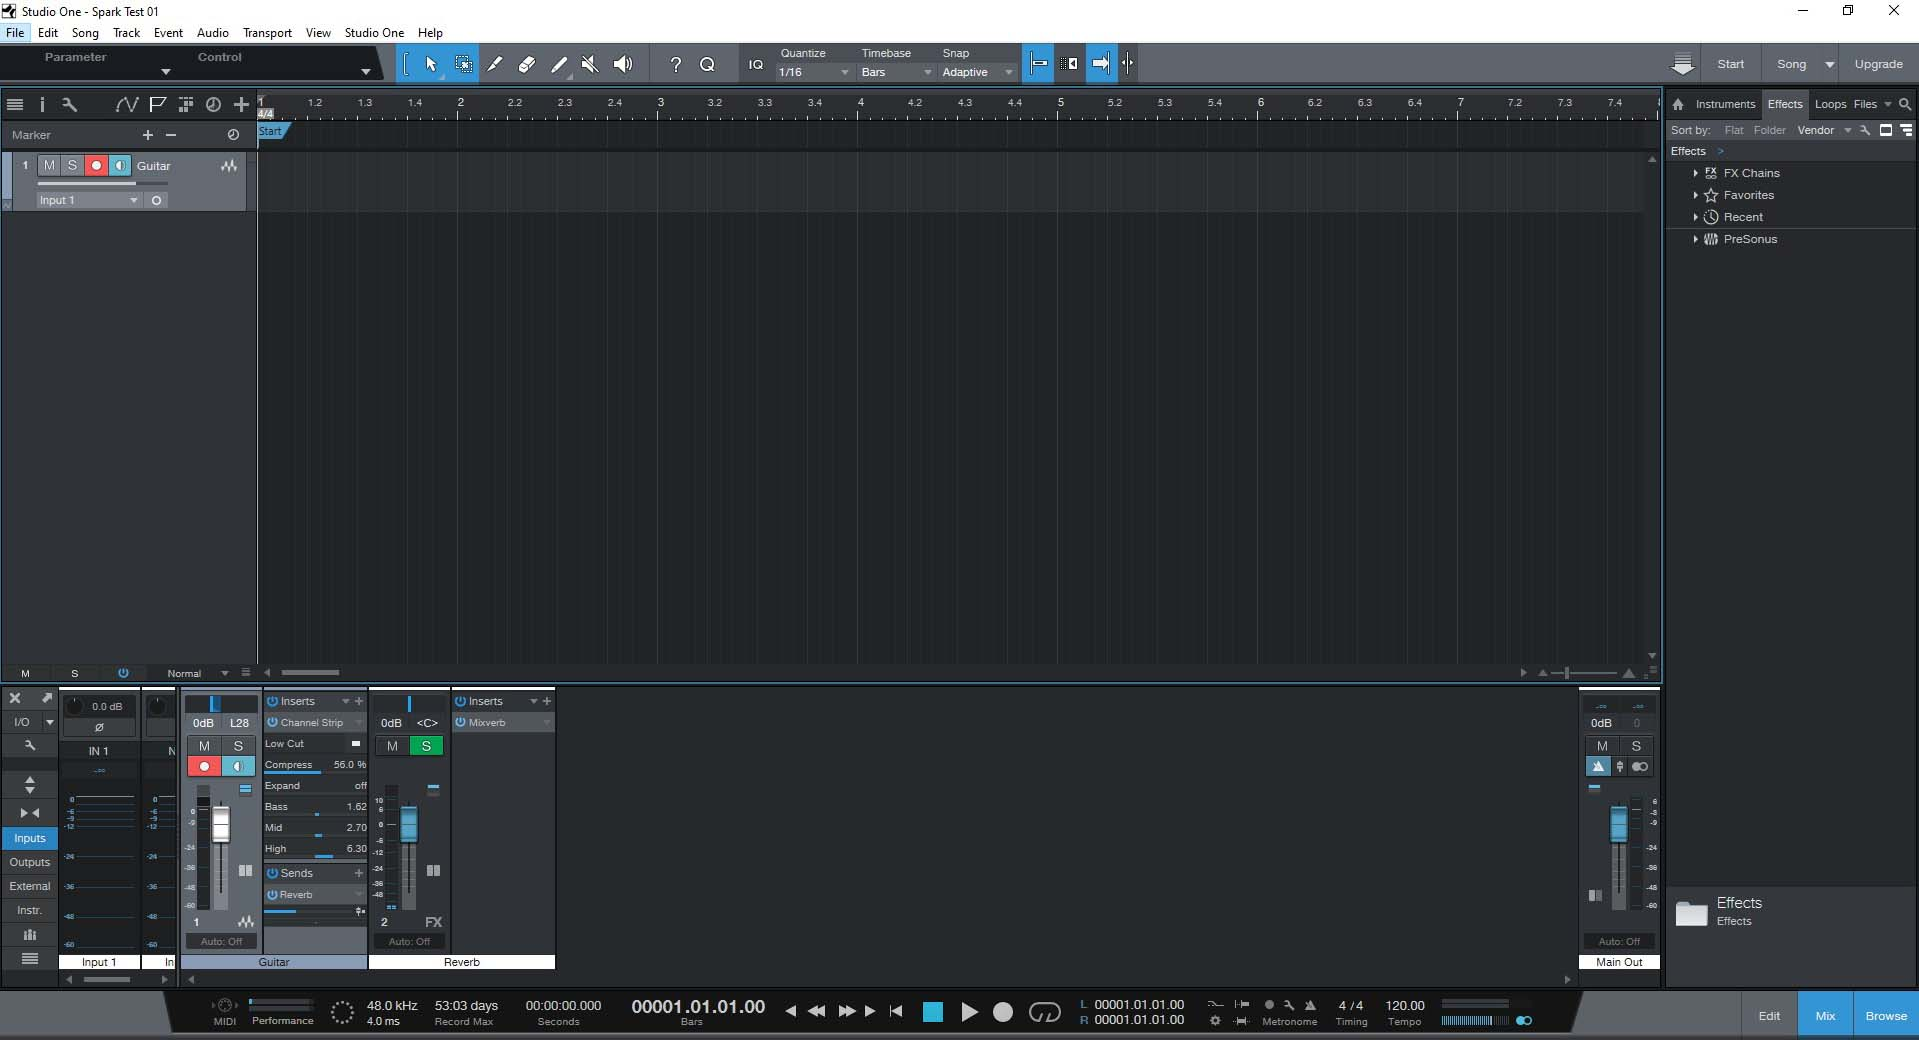 PreSonus Studio One Prime Guitar Track